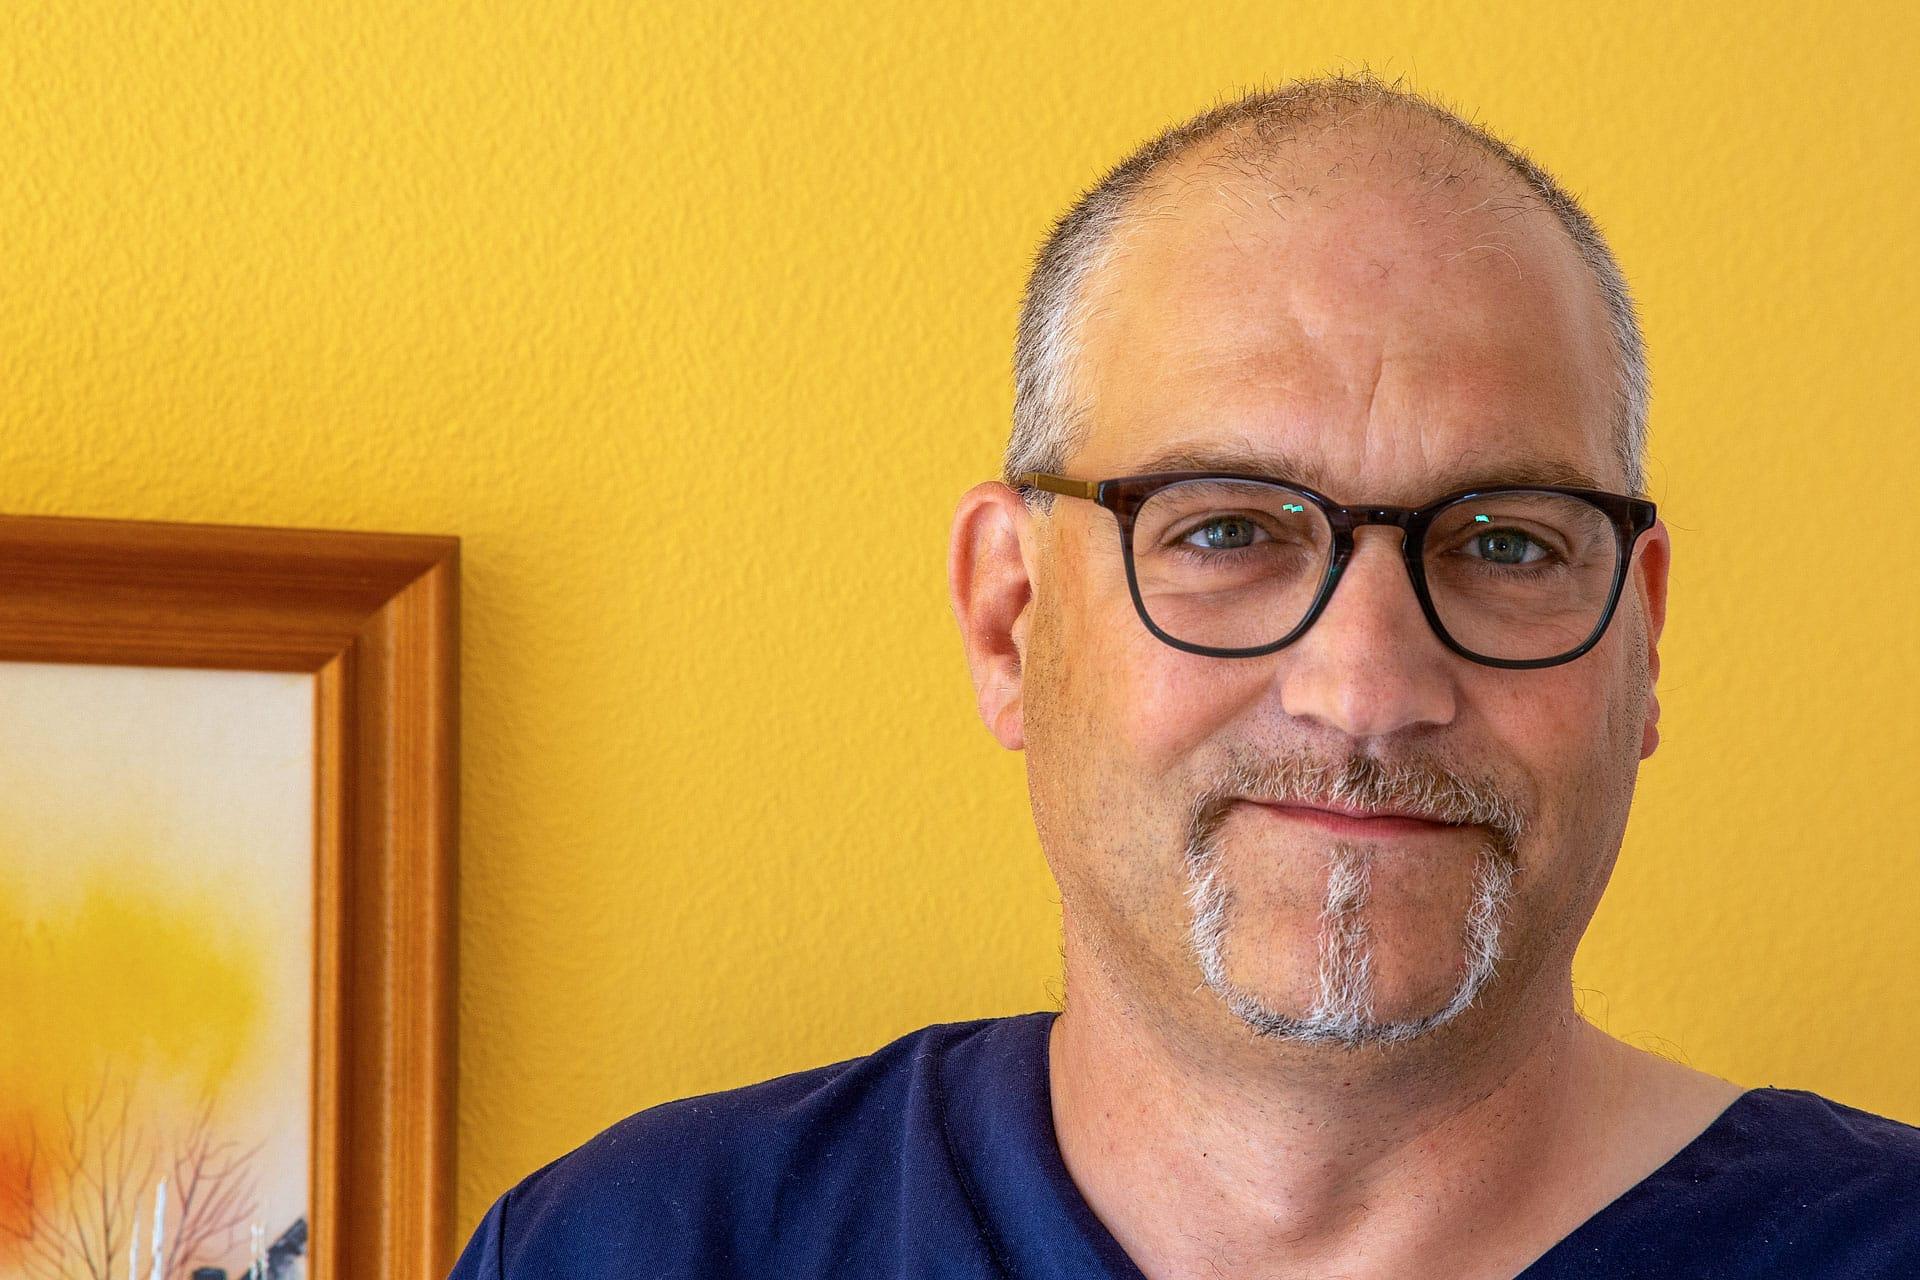 Matthias Groth - Portrait